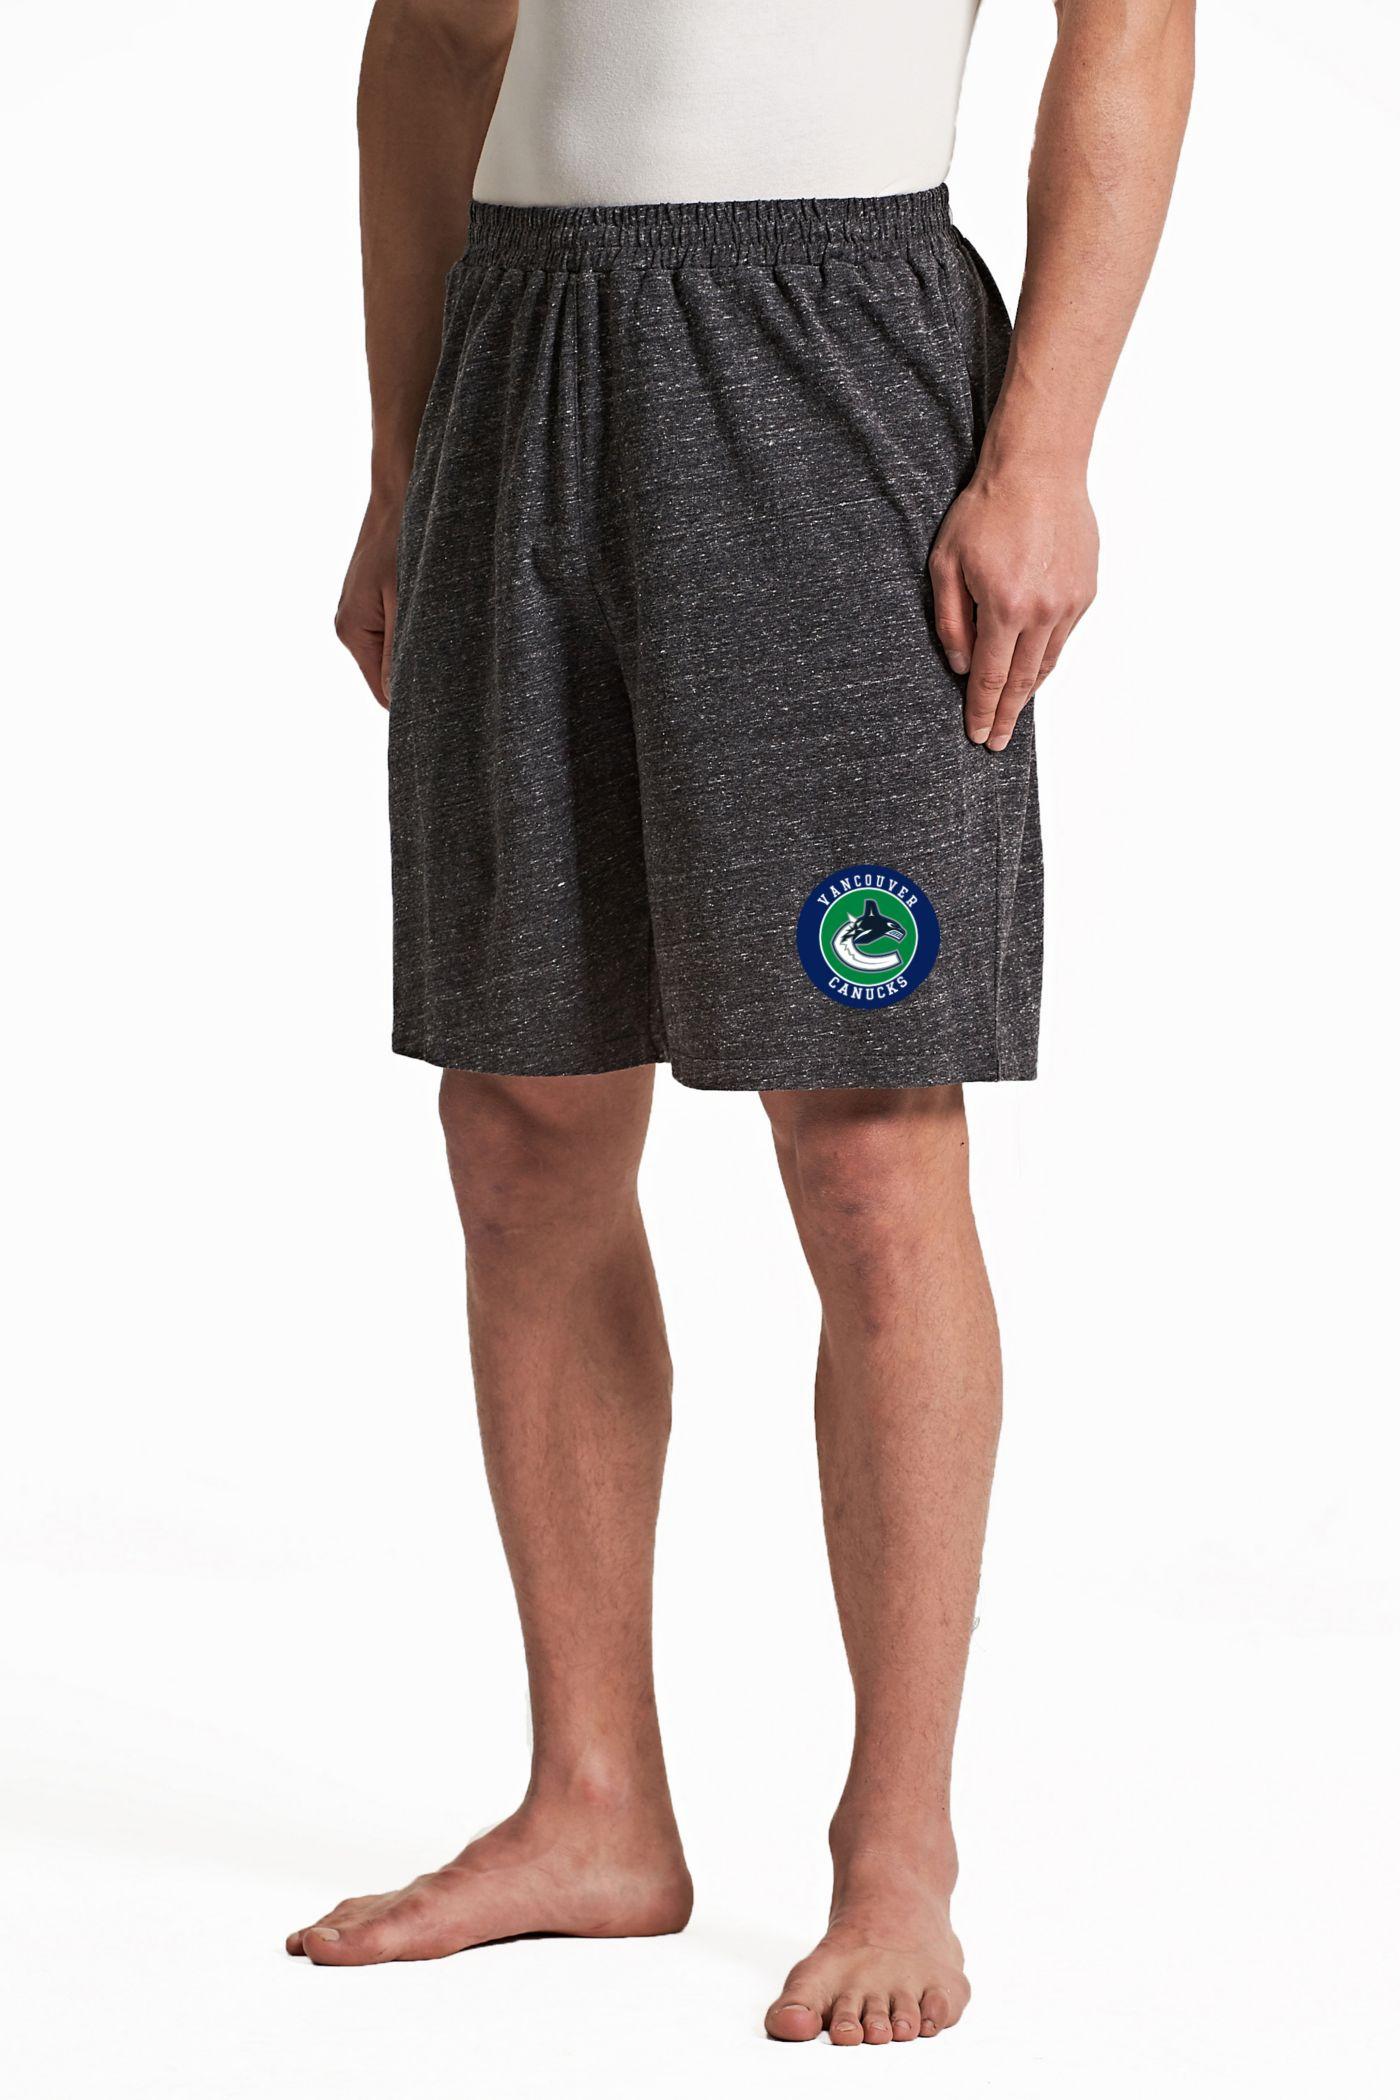 Concepts Sport Men's Vancouver Canucks Pitch Grey Shorts